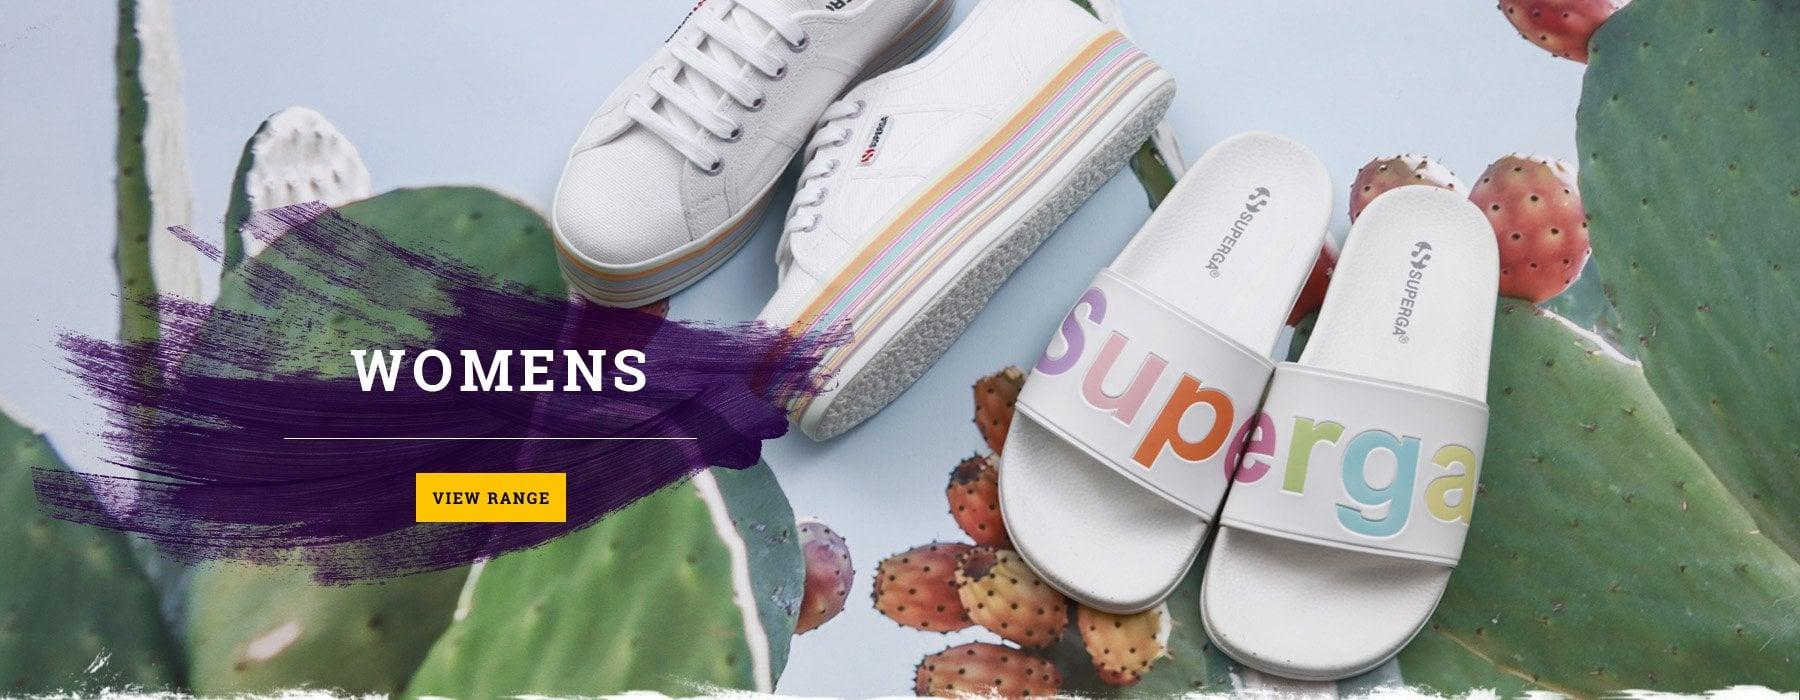 20cd256c69 Scorpio Shoes - Independent UK Shoe Shop Established 1960